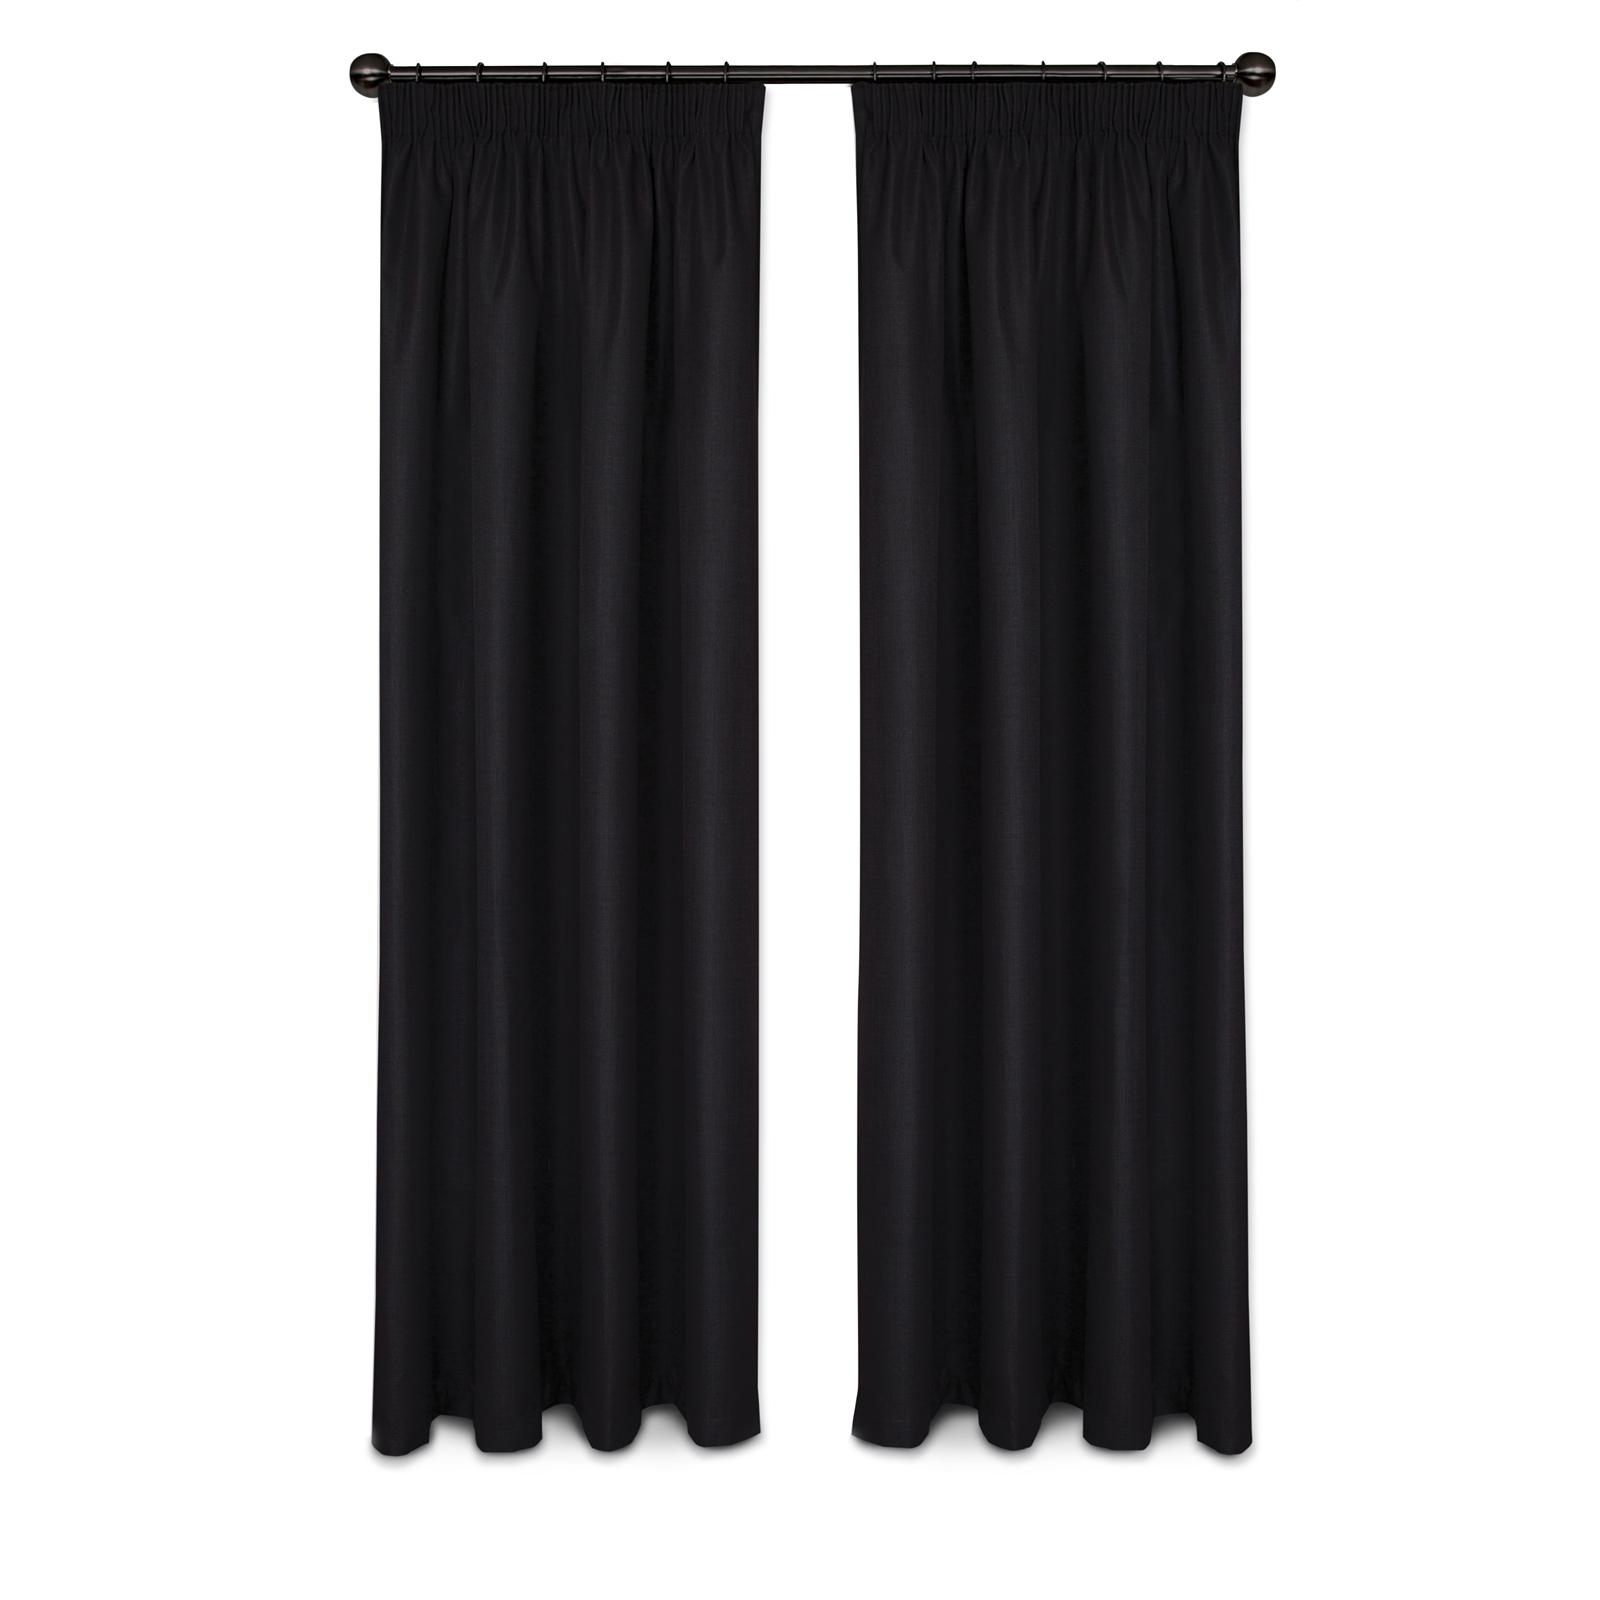 Home Style 2.3 - 3 x 1.6m Como Triple Weave Curtain